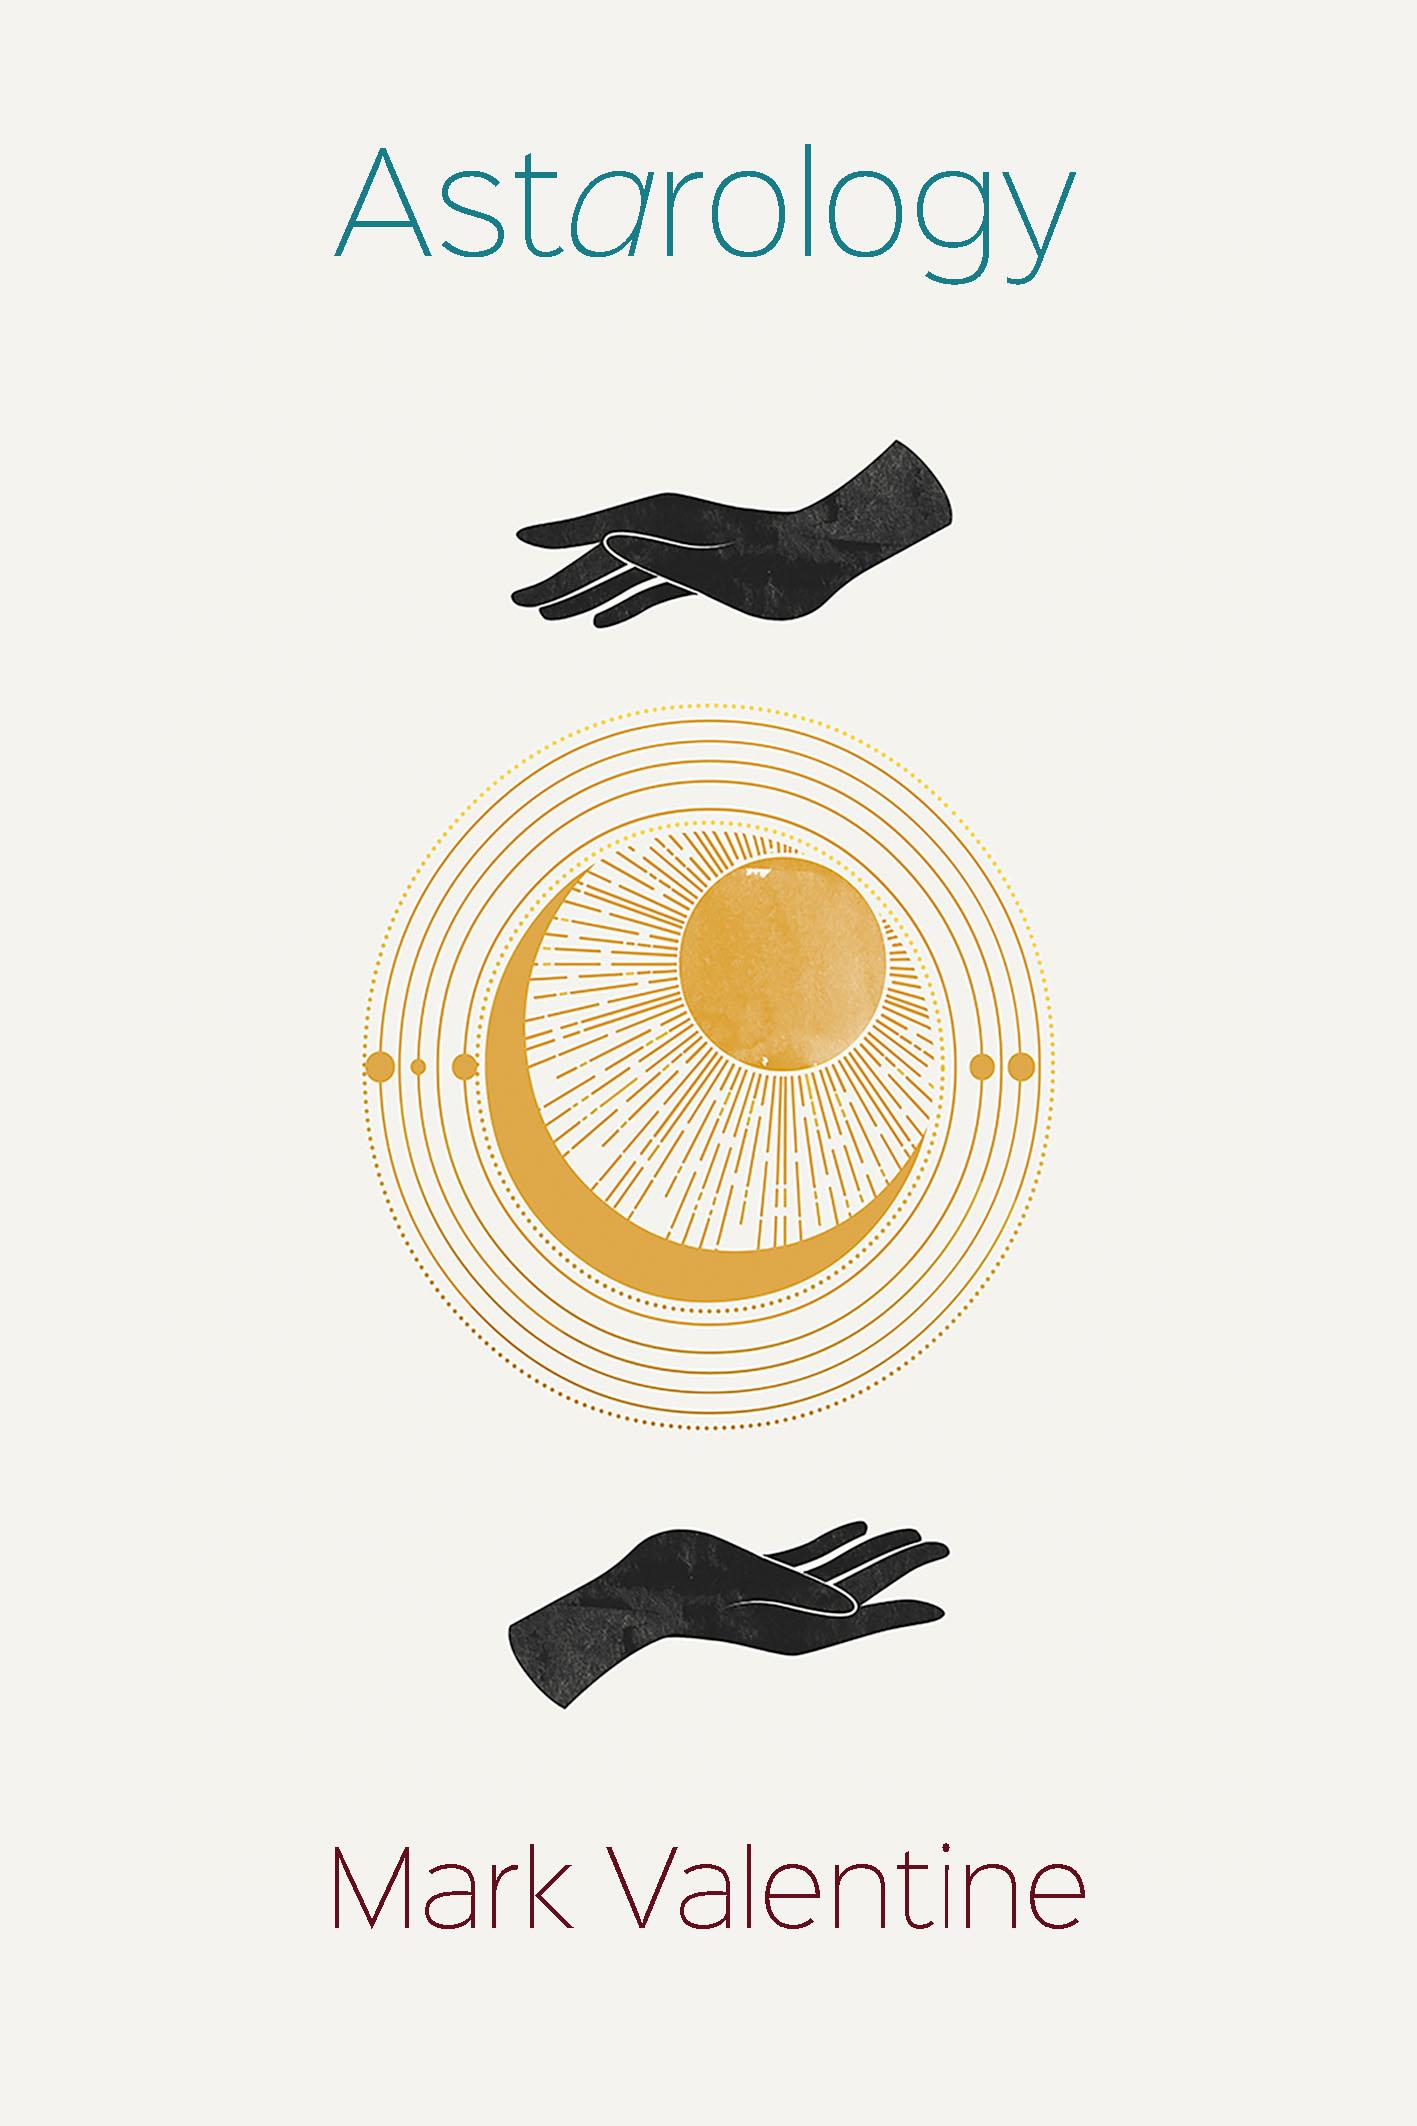 Astarology - Mark Valentine